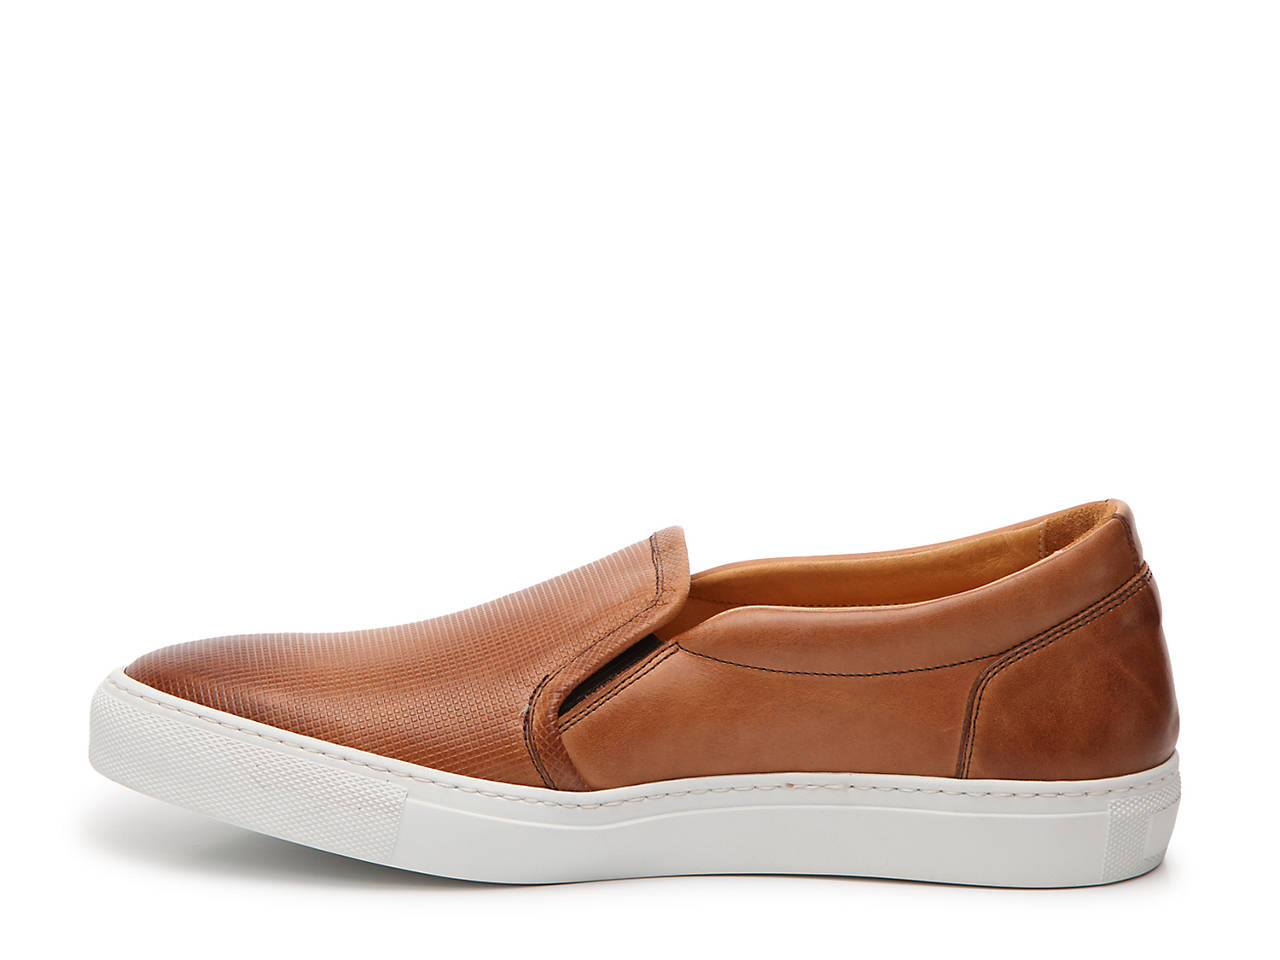 FOOTWEAR - Low-tops & sneakers Mercanti Fiorentini gEEE7fMj3A